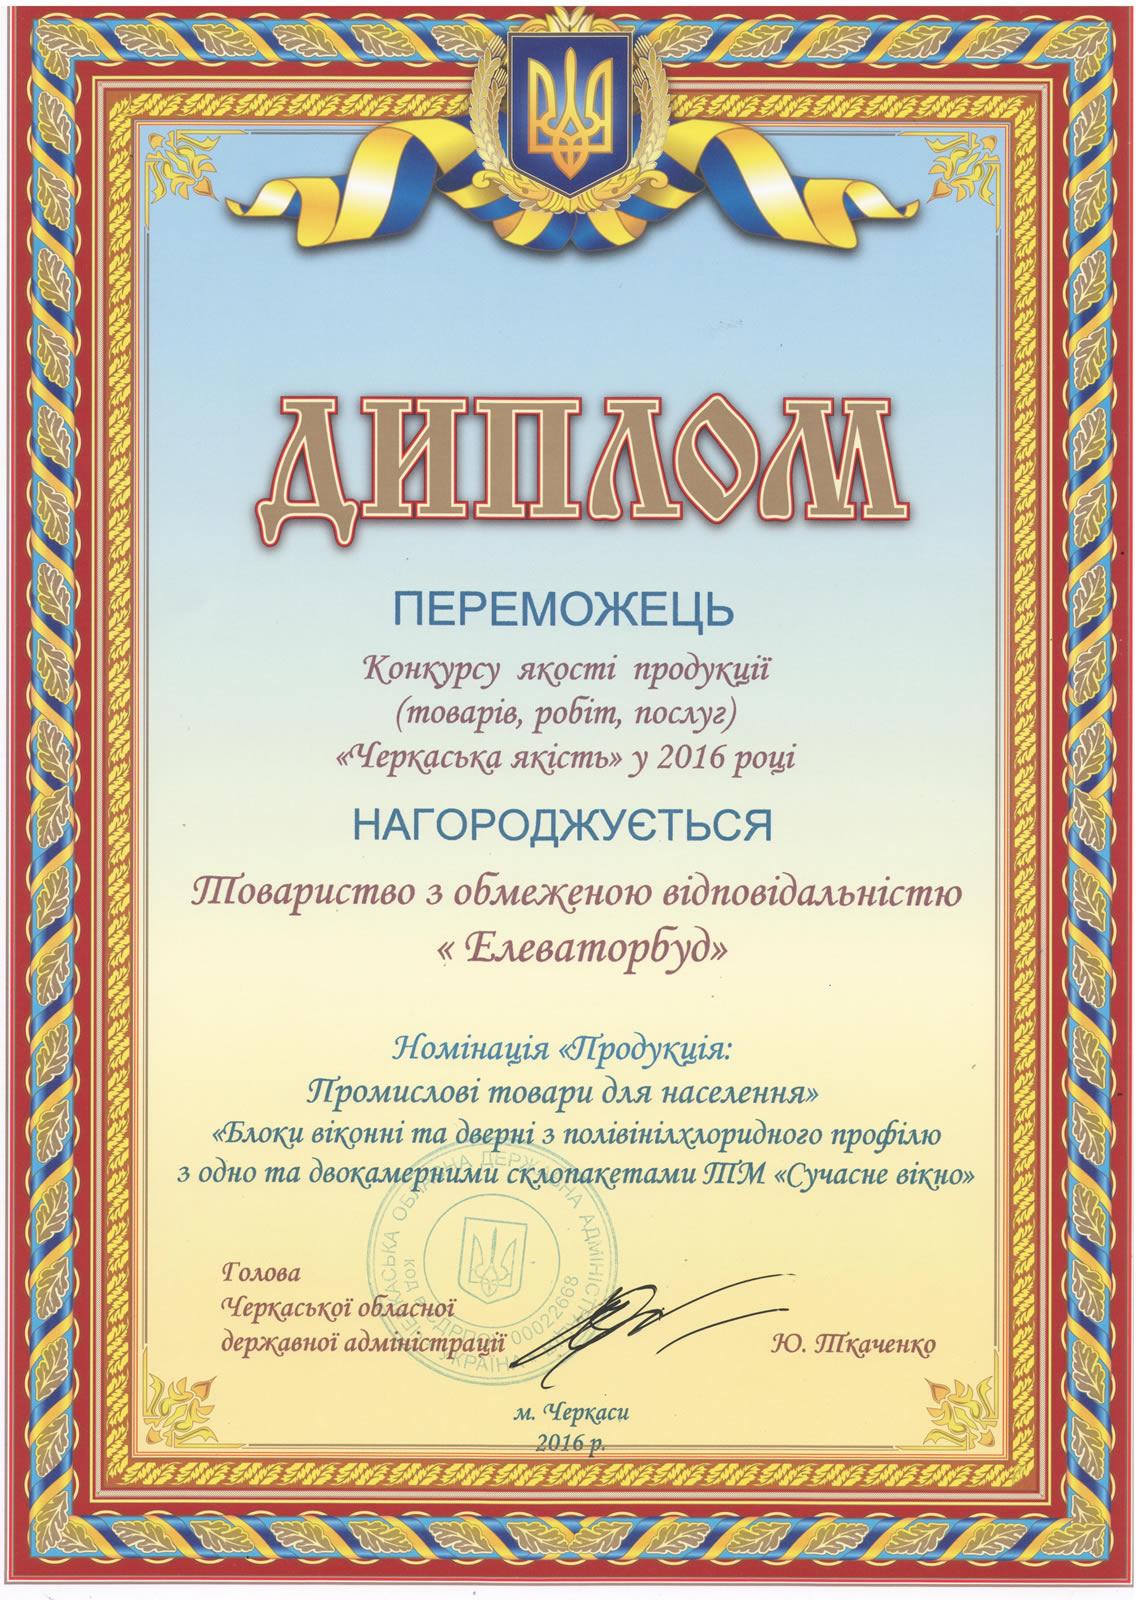 Победитель конкурса качества продукции ТМ 'Сучасне Вікно'